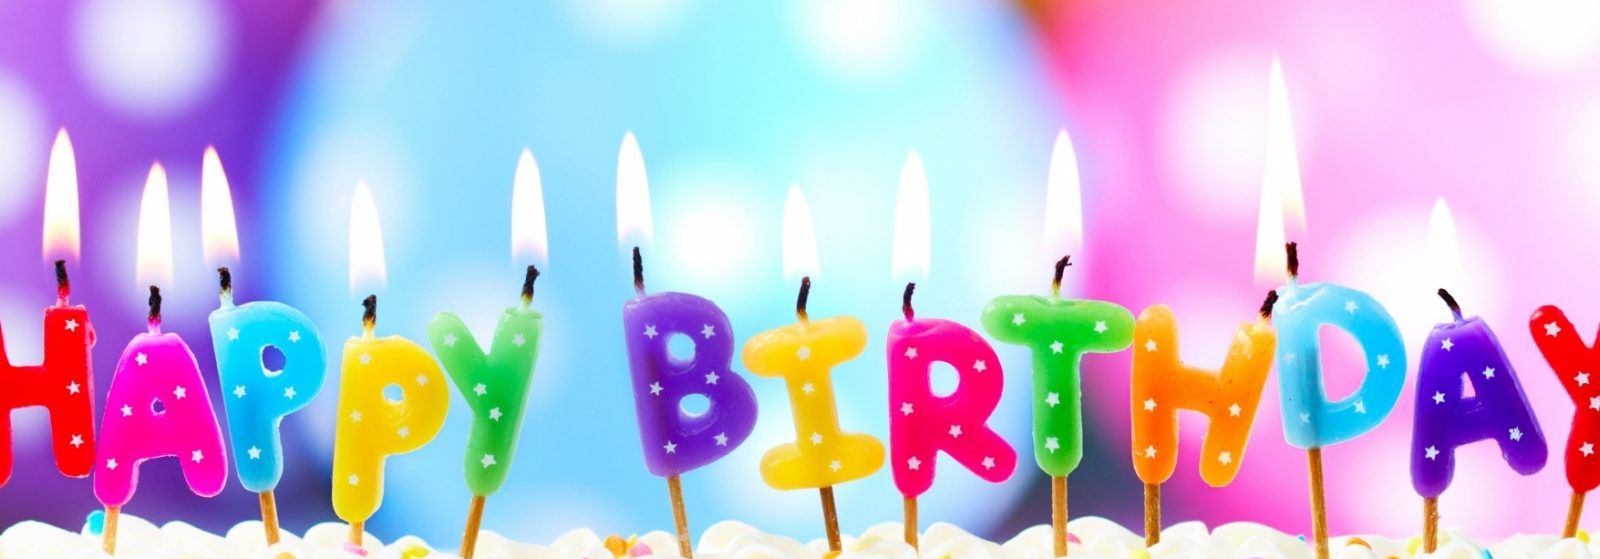 корпоратив на день рождения